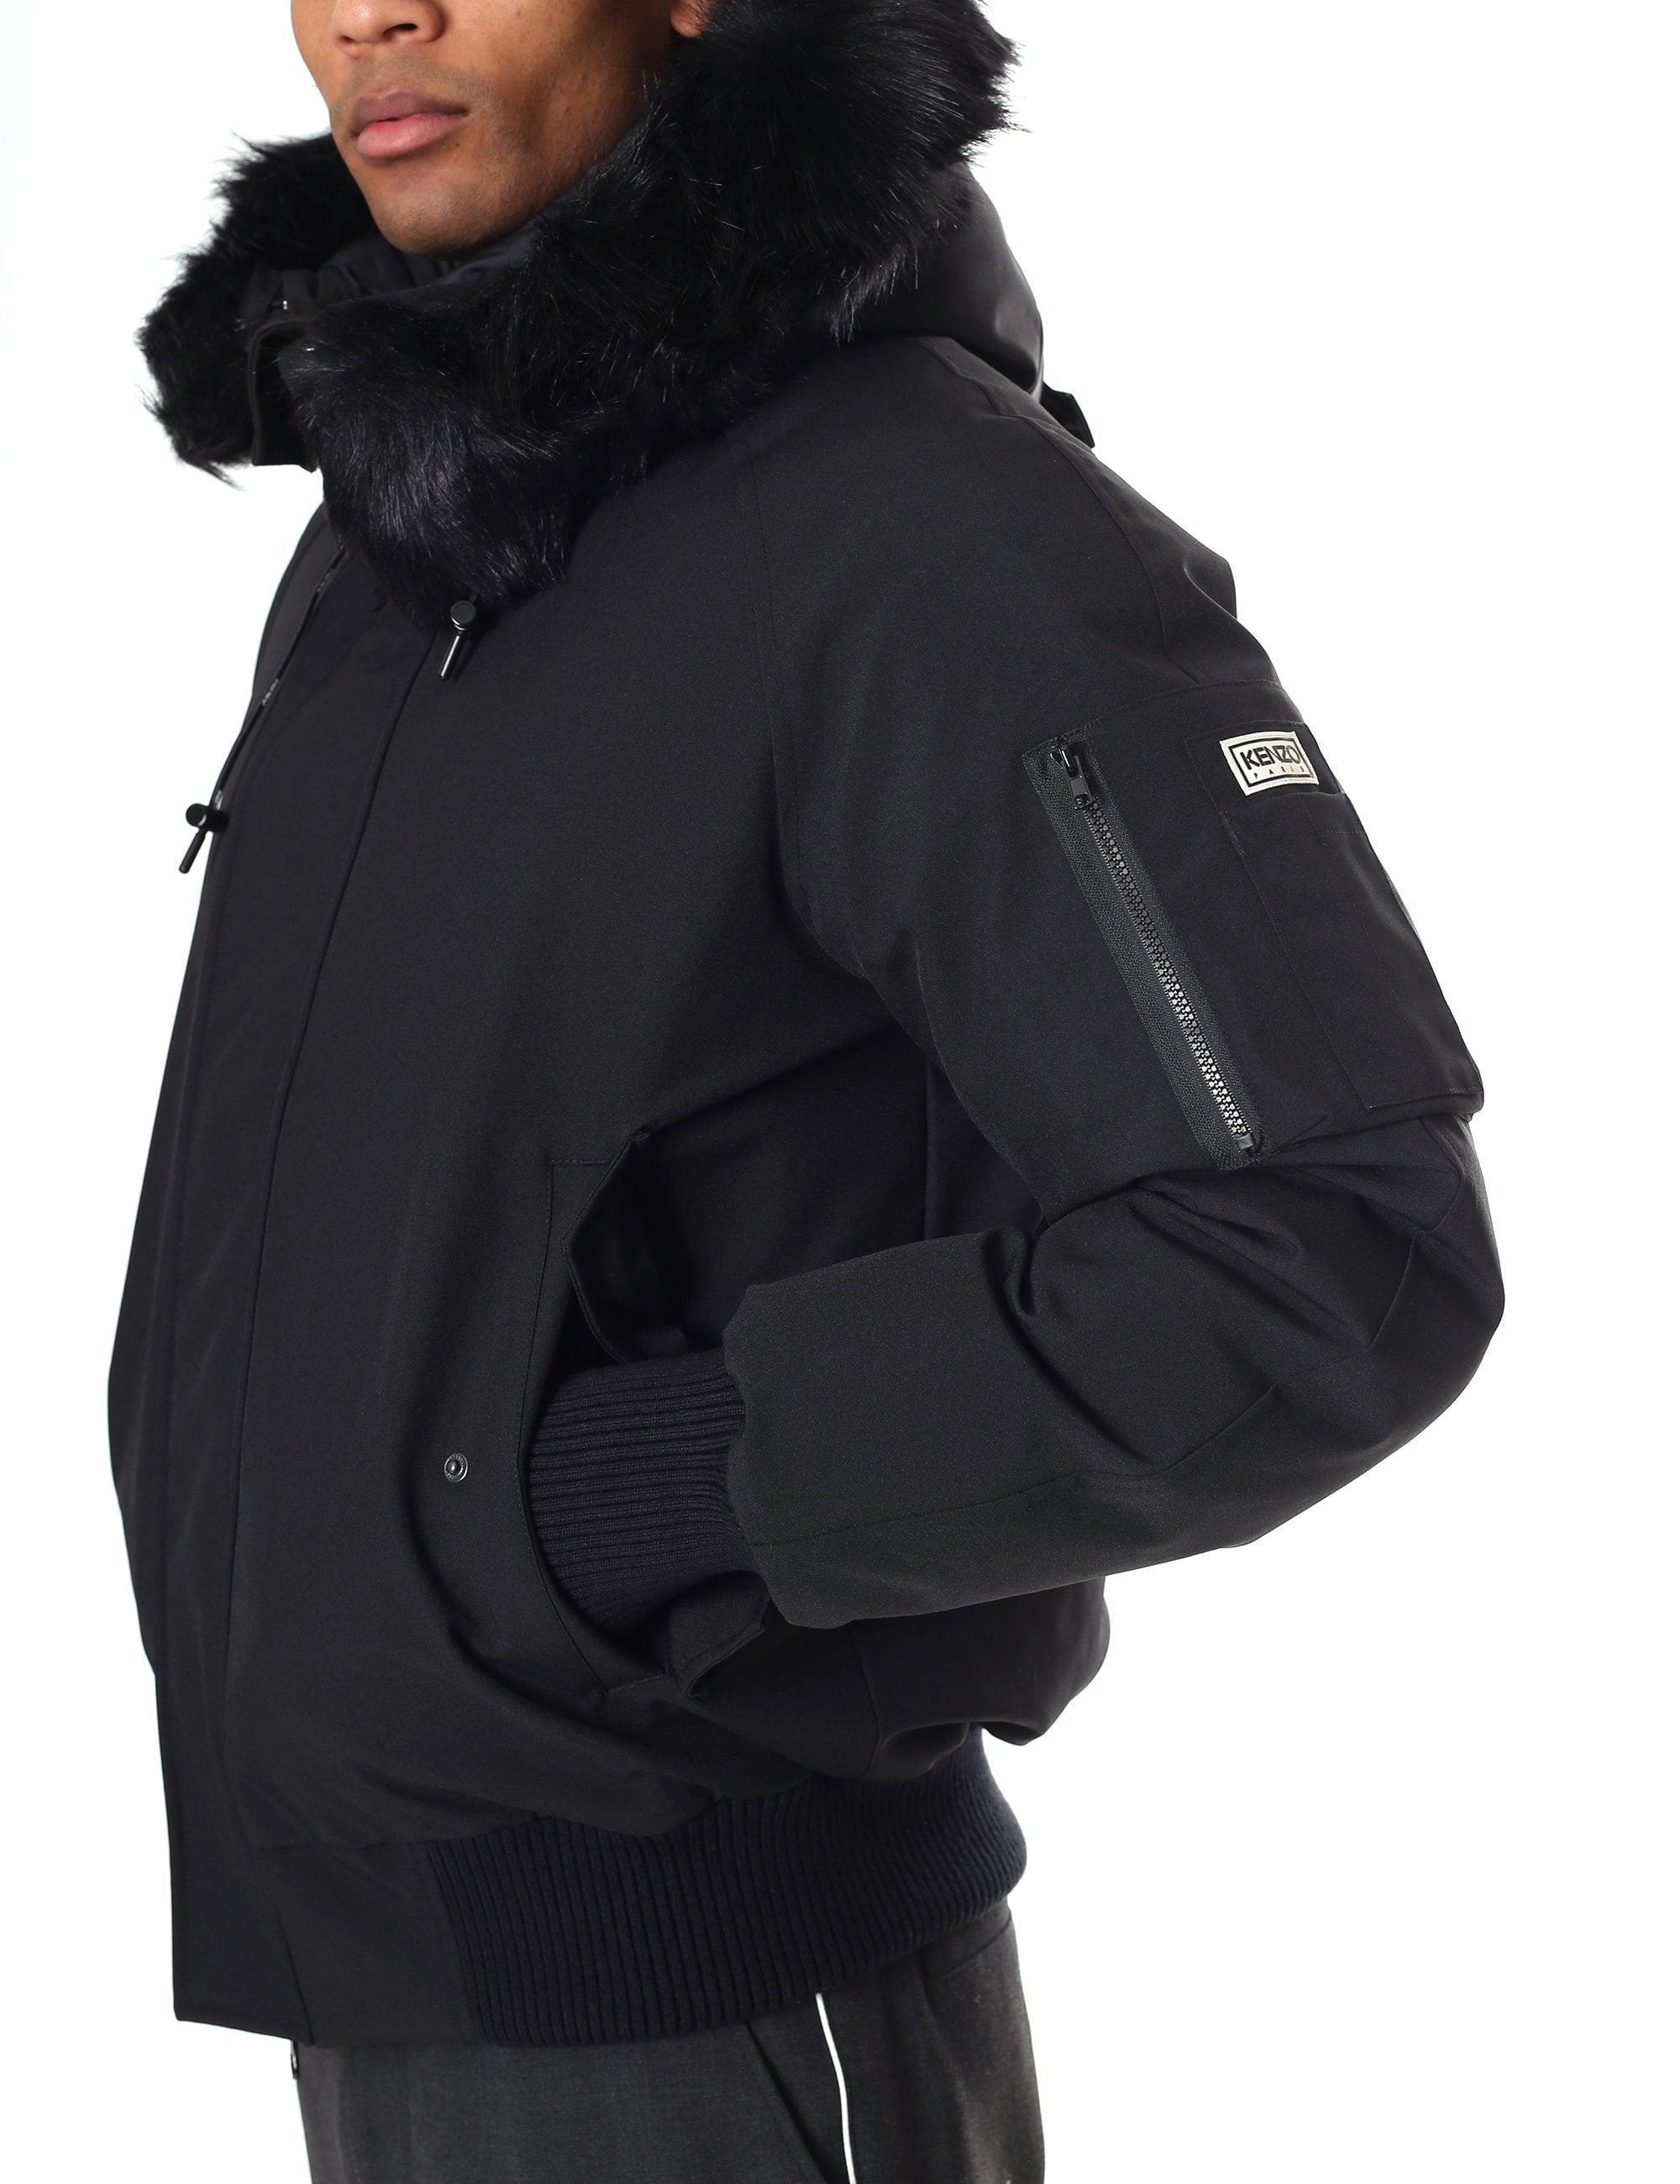 c2d774a30 KENZO Men's Technic Canvas Winter Blouson in Black for Men - Lyst